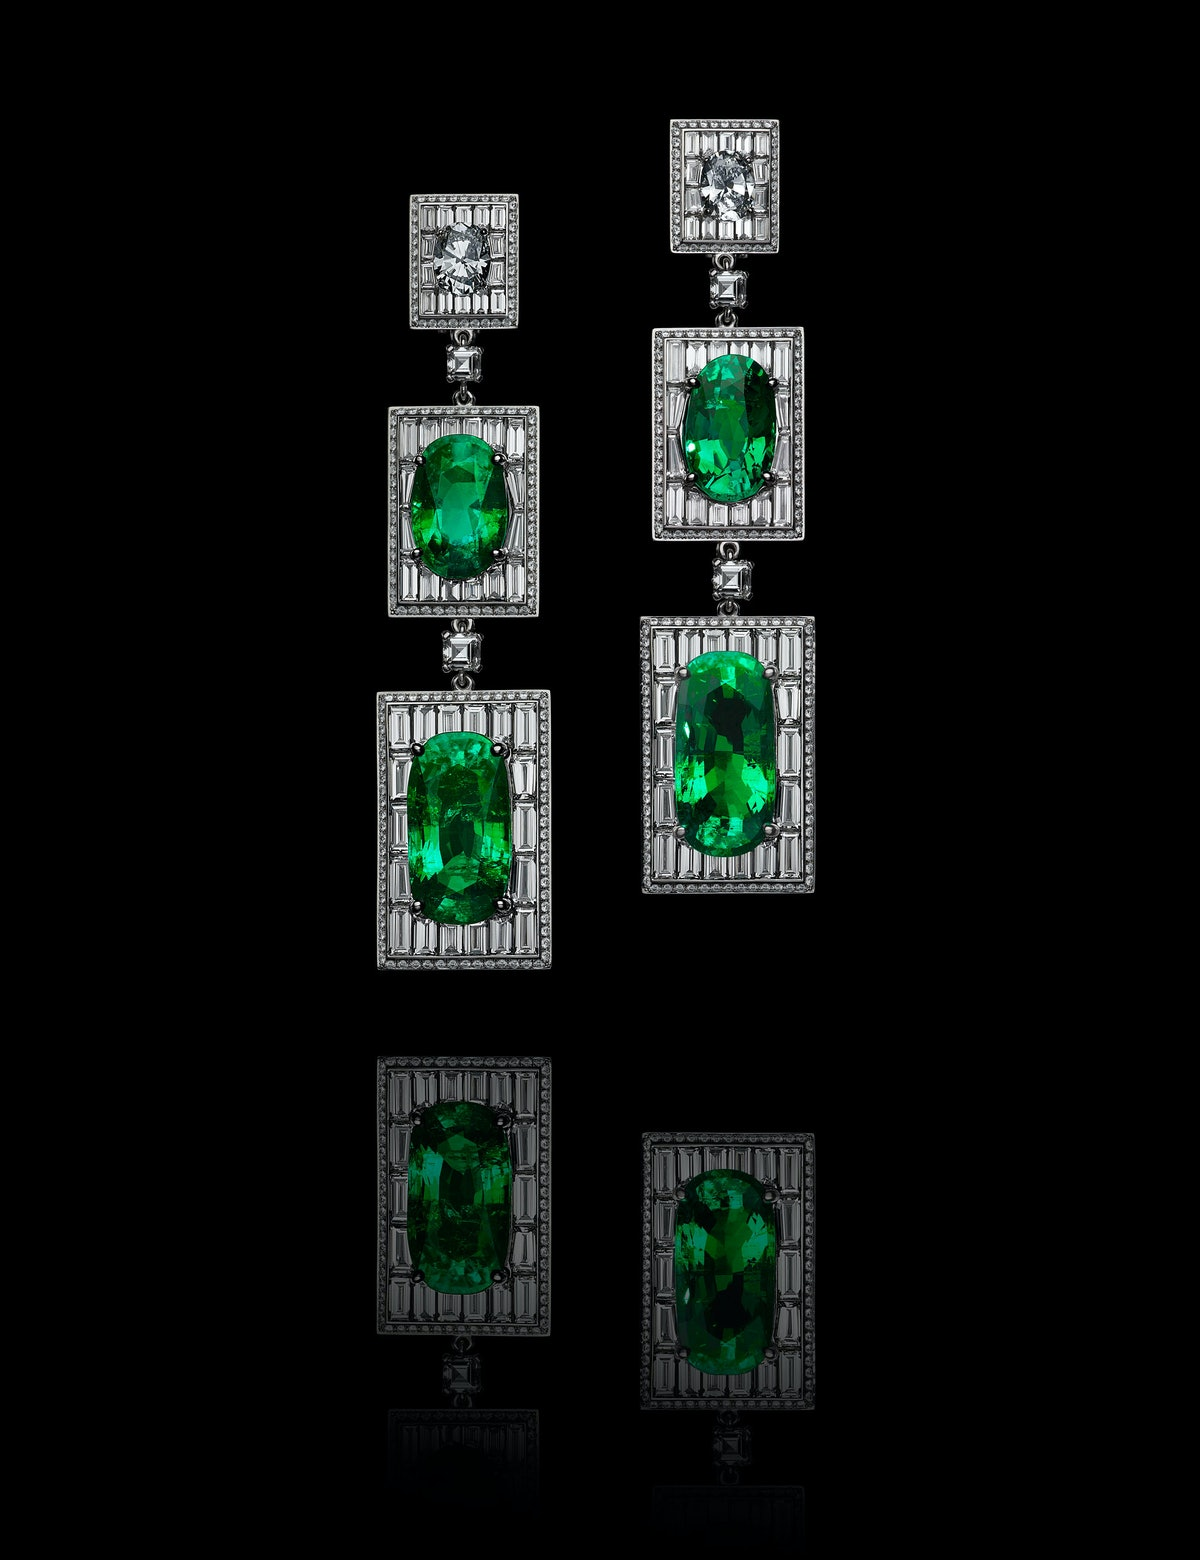 Emerald and diamond earrings, design by Olivier Reza. Courtesy of Alexandre Reza.